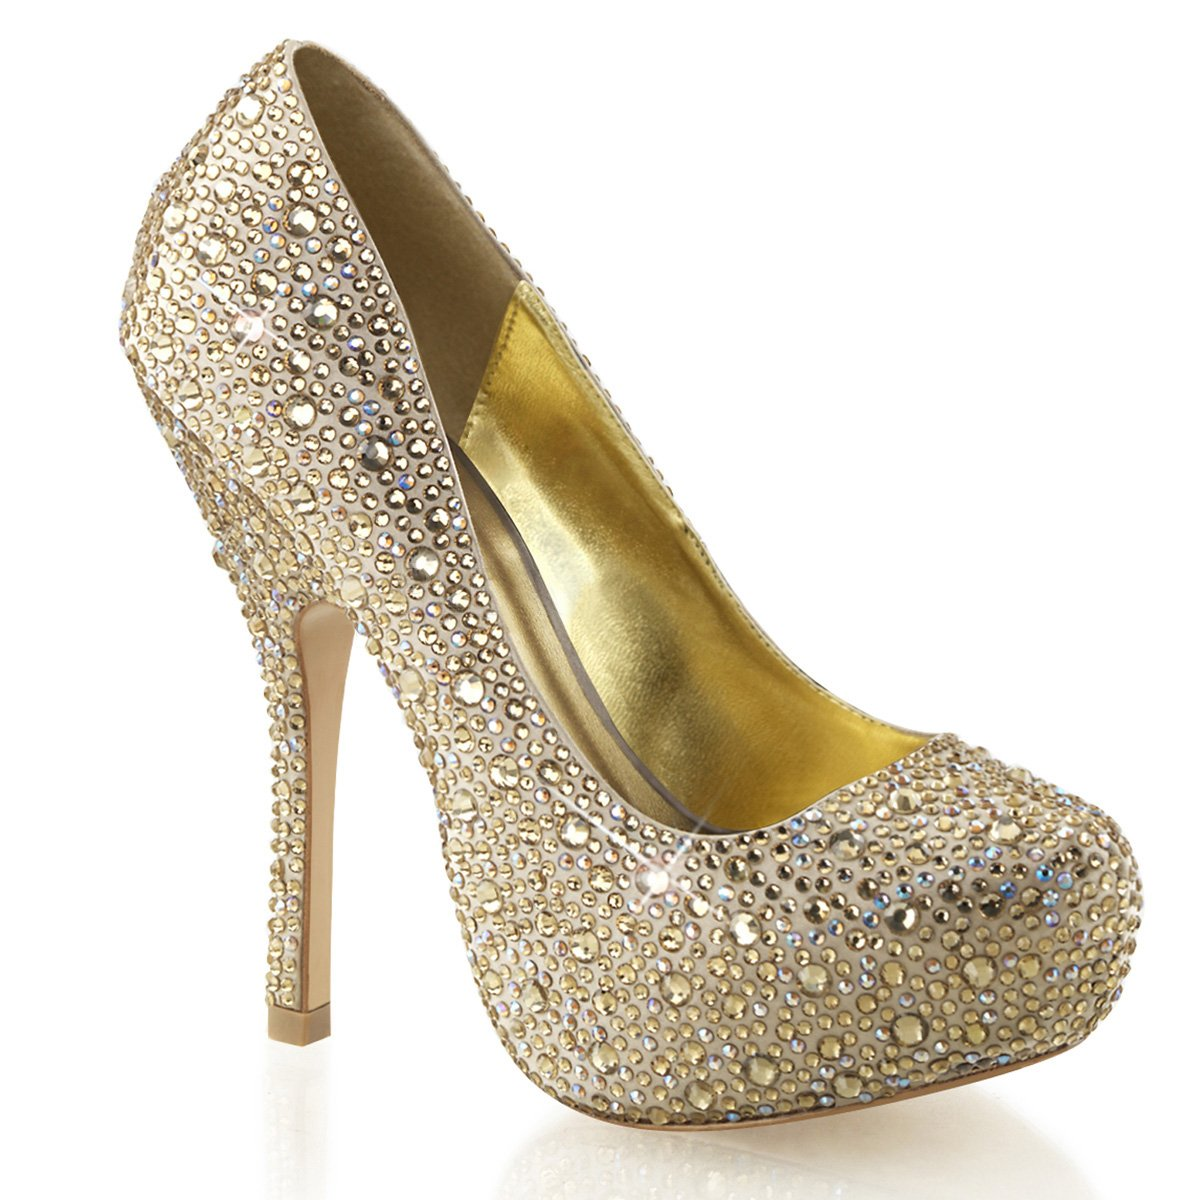 Fabulicious FELICITY-20 - Zapatos de vestir para mujer 42.5 EU|Satin Champagner